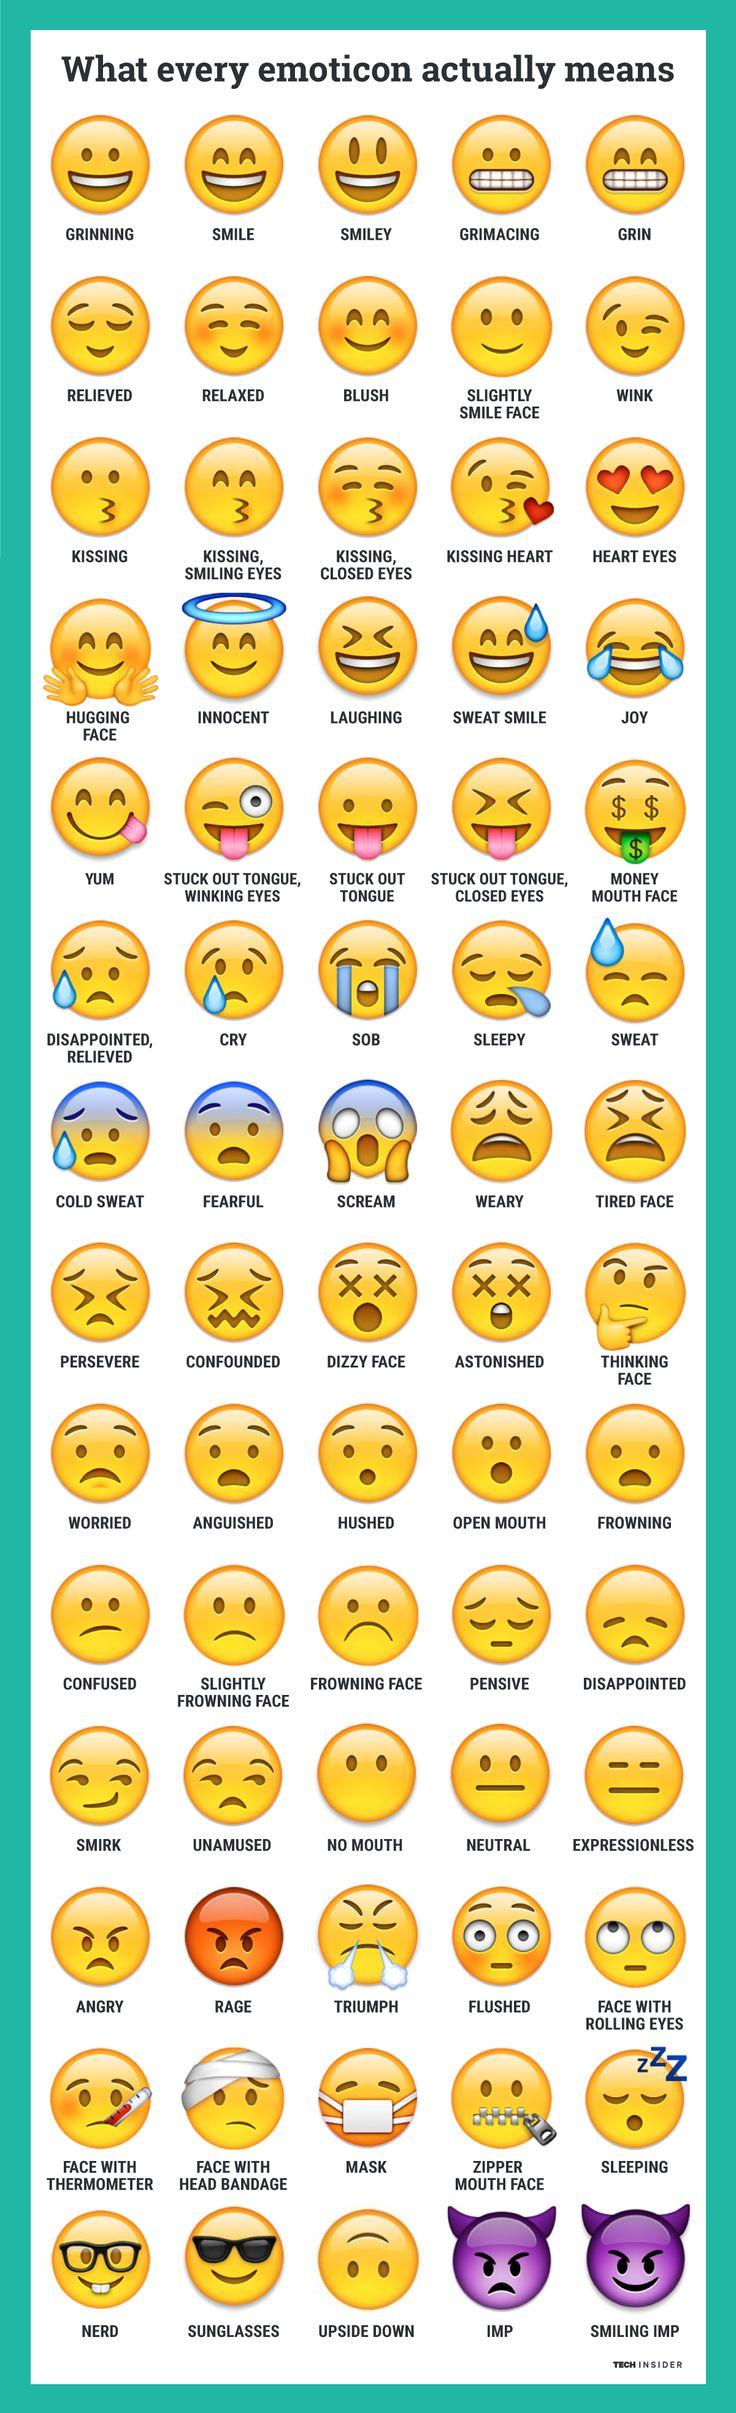 Emoticons are pretty important:  Harvard cognitive scientist Steven Pinker says ... fea8e515f2d23ec8bdea88313debb533  every emoji the emoji